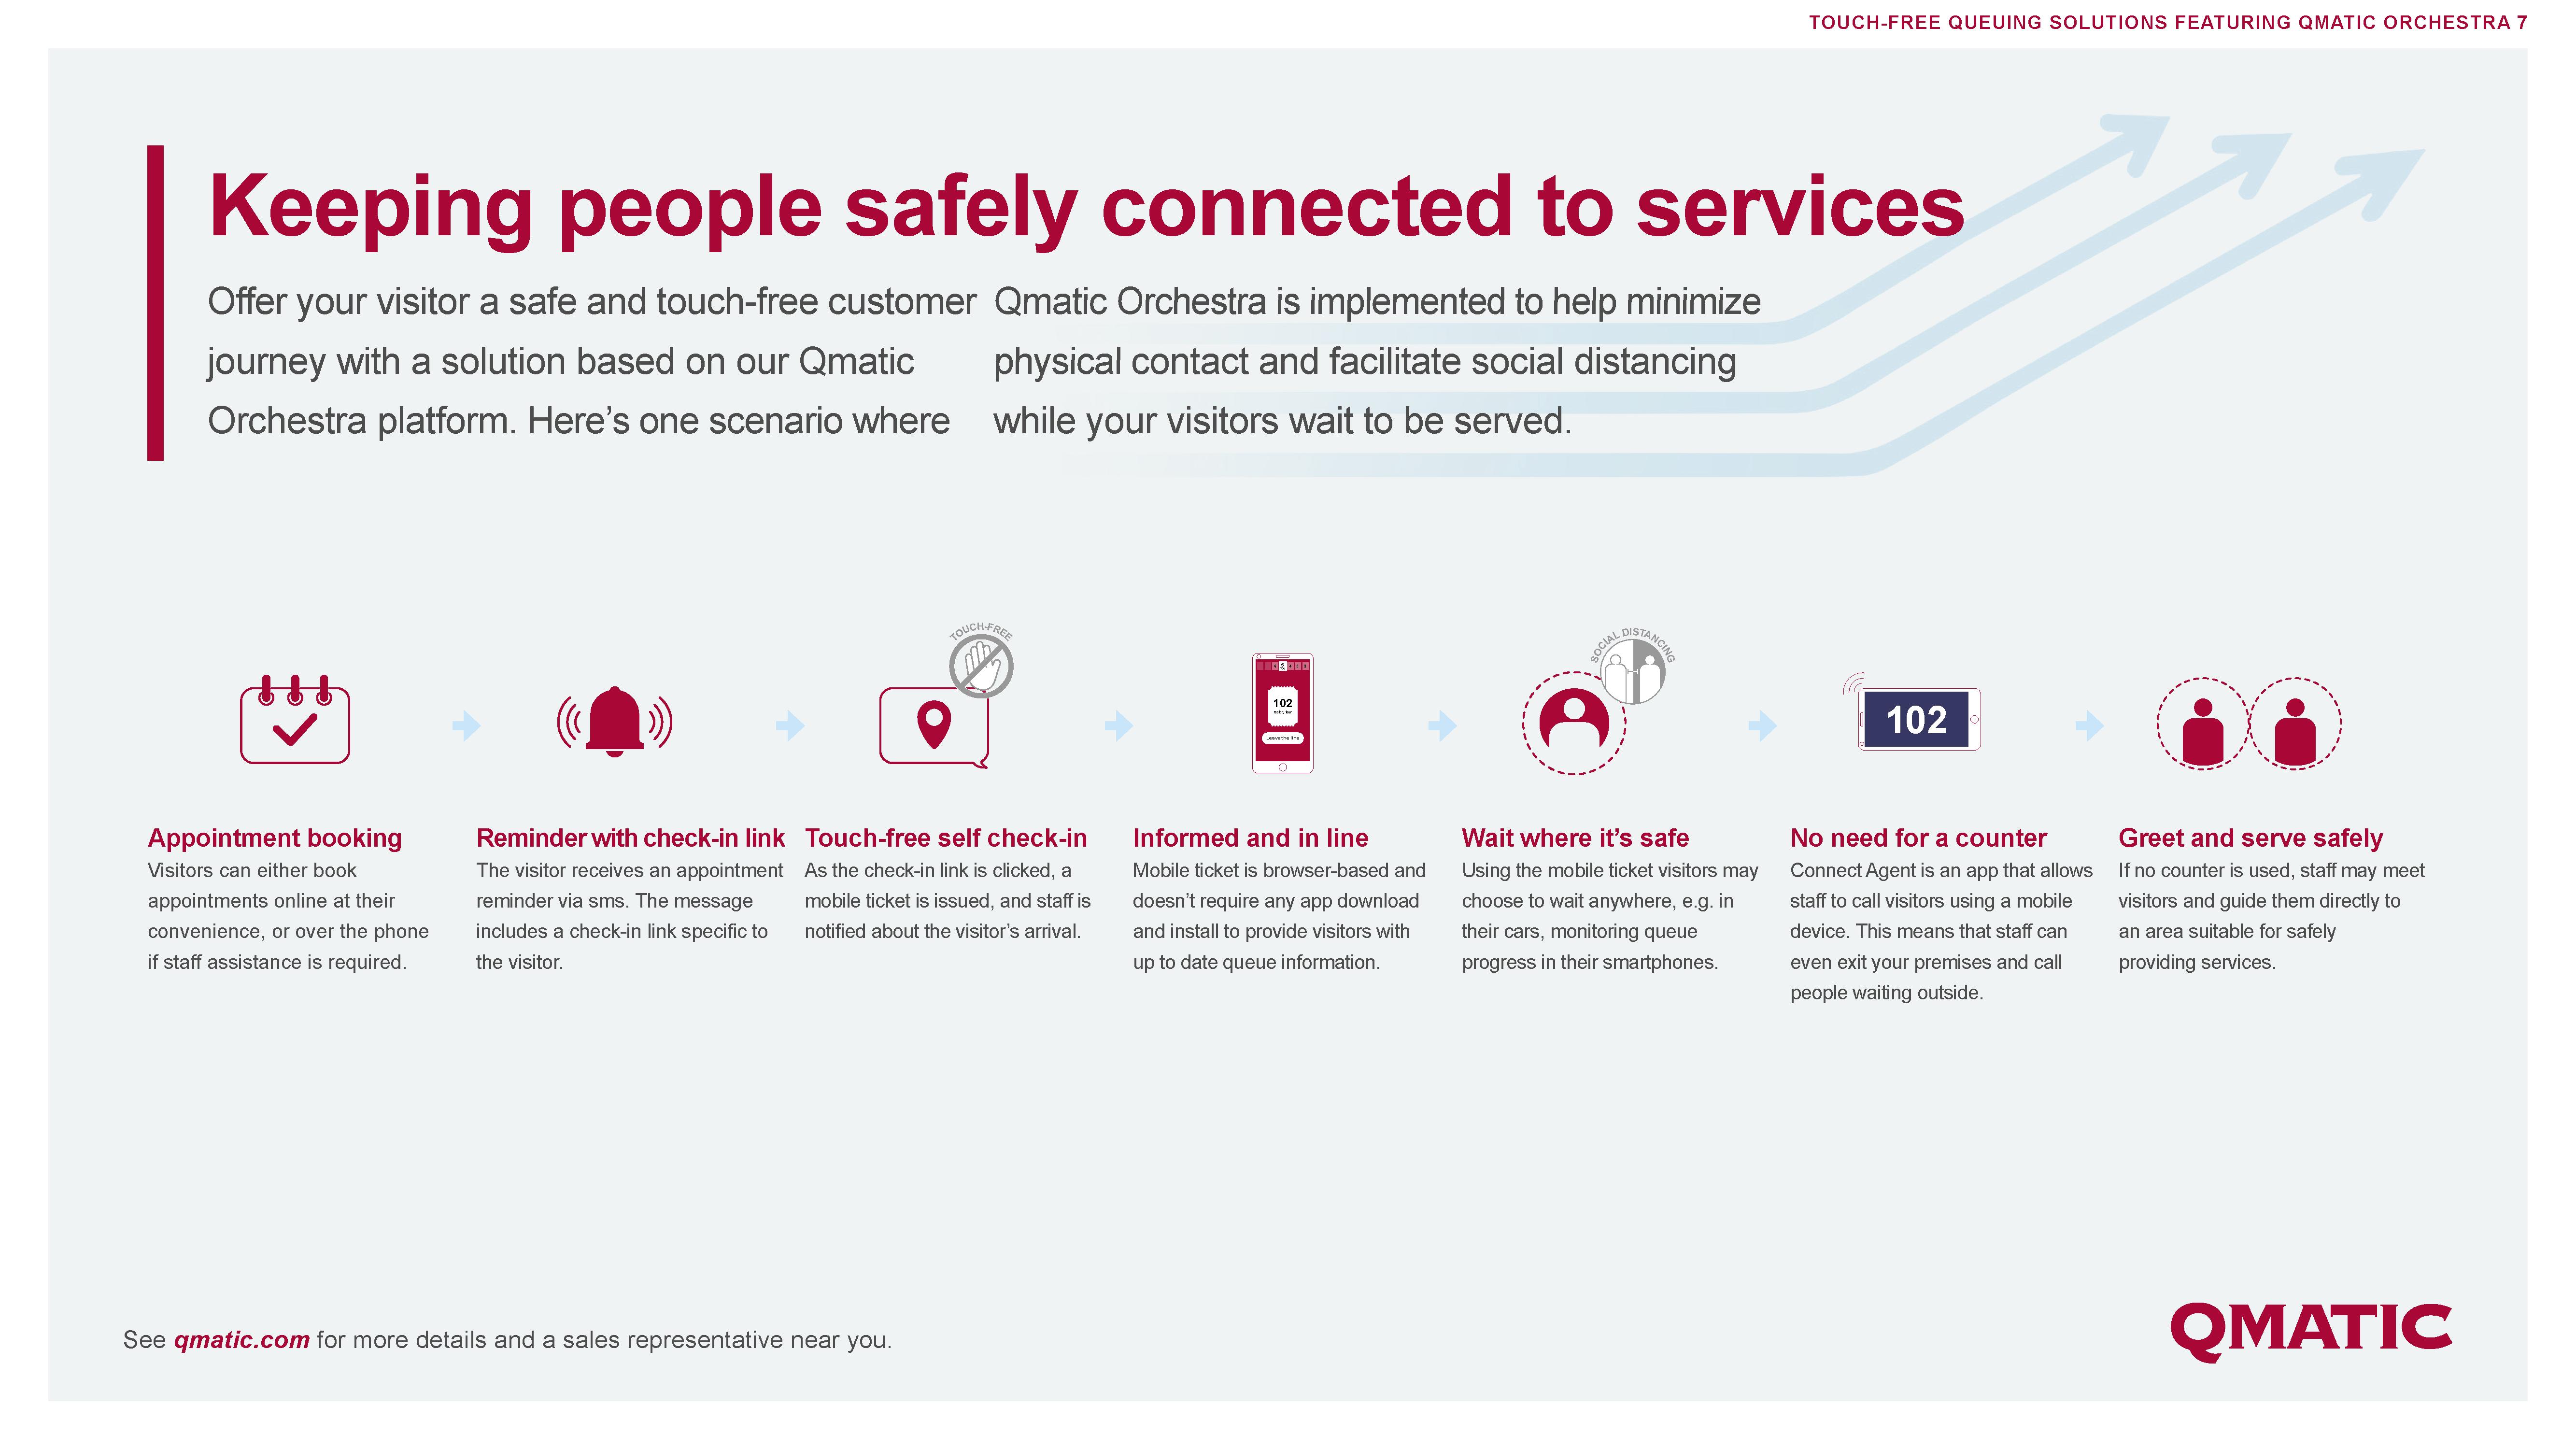 infographic-touchfree-cjm-social